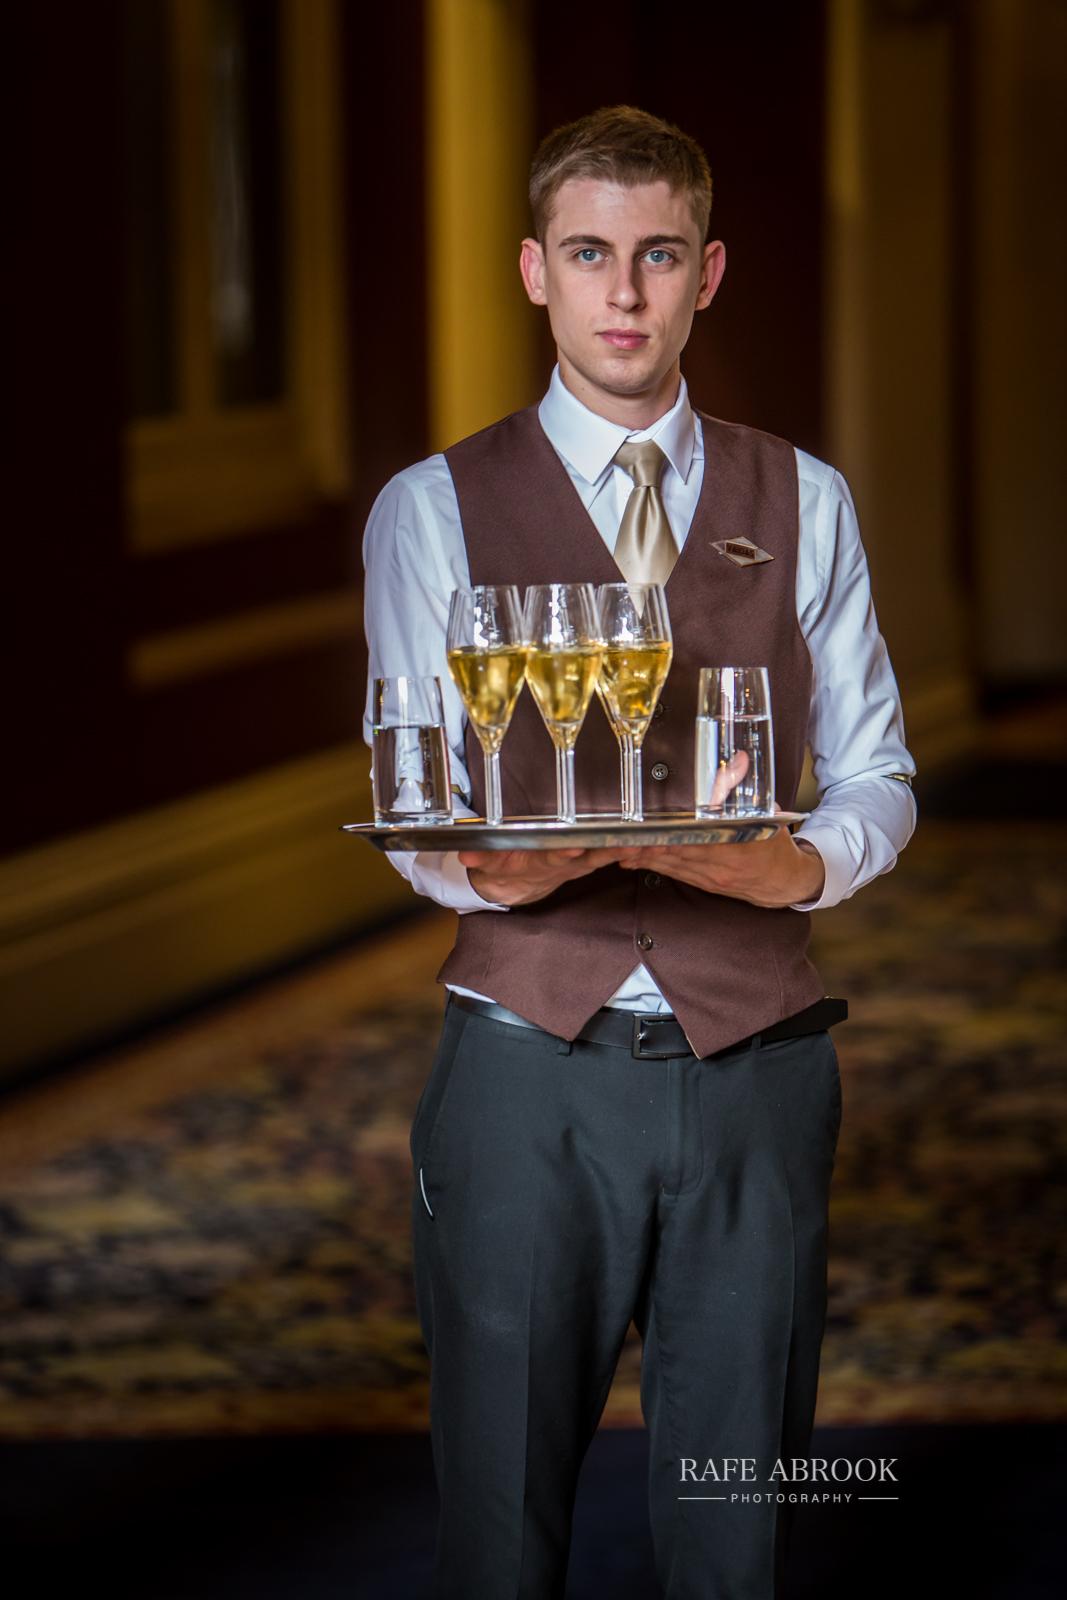 wedding photographer hertfordshire london st pancras renaissance hotel station grand staircase-1106.jpg